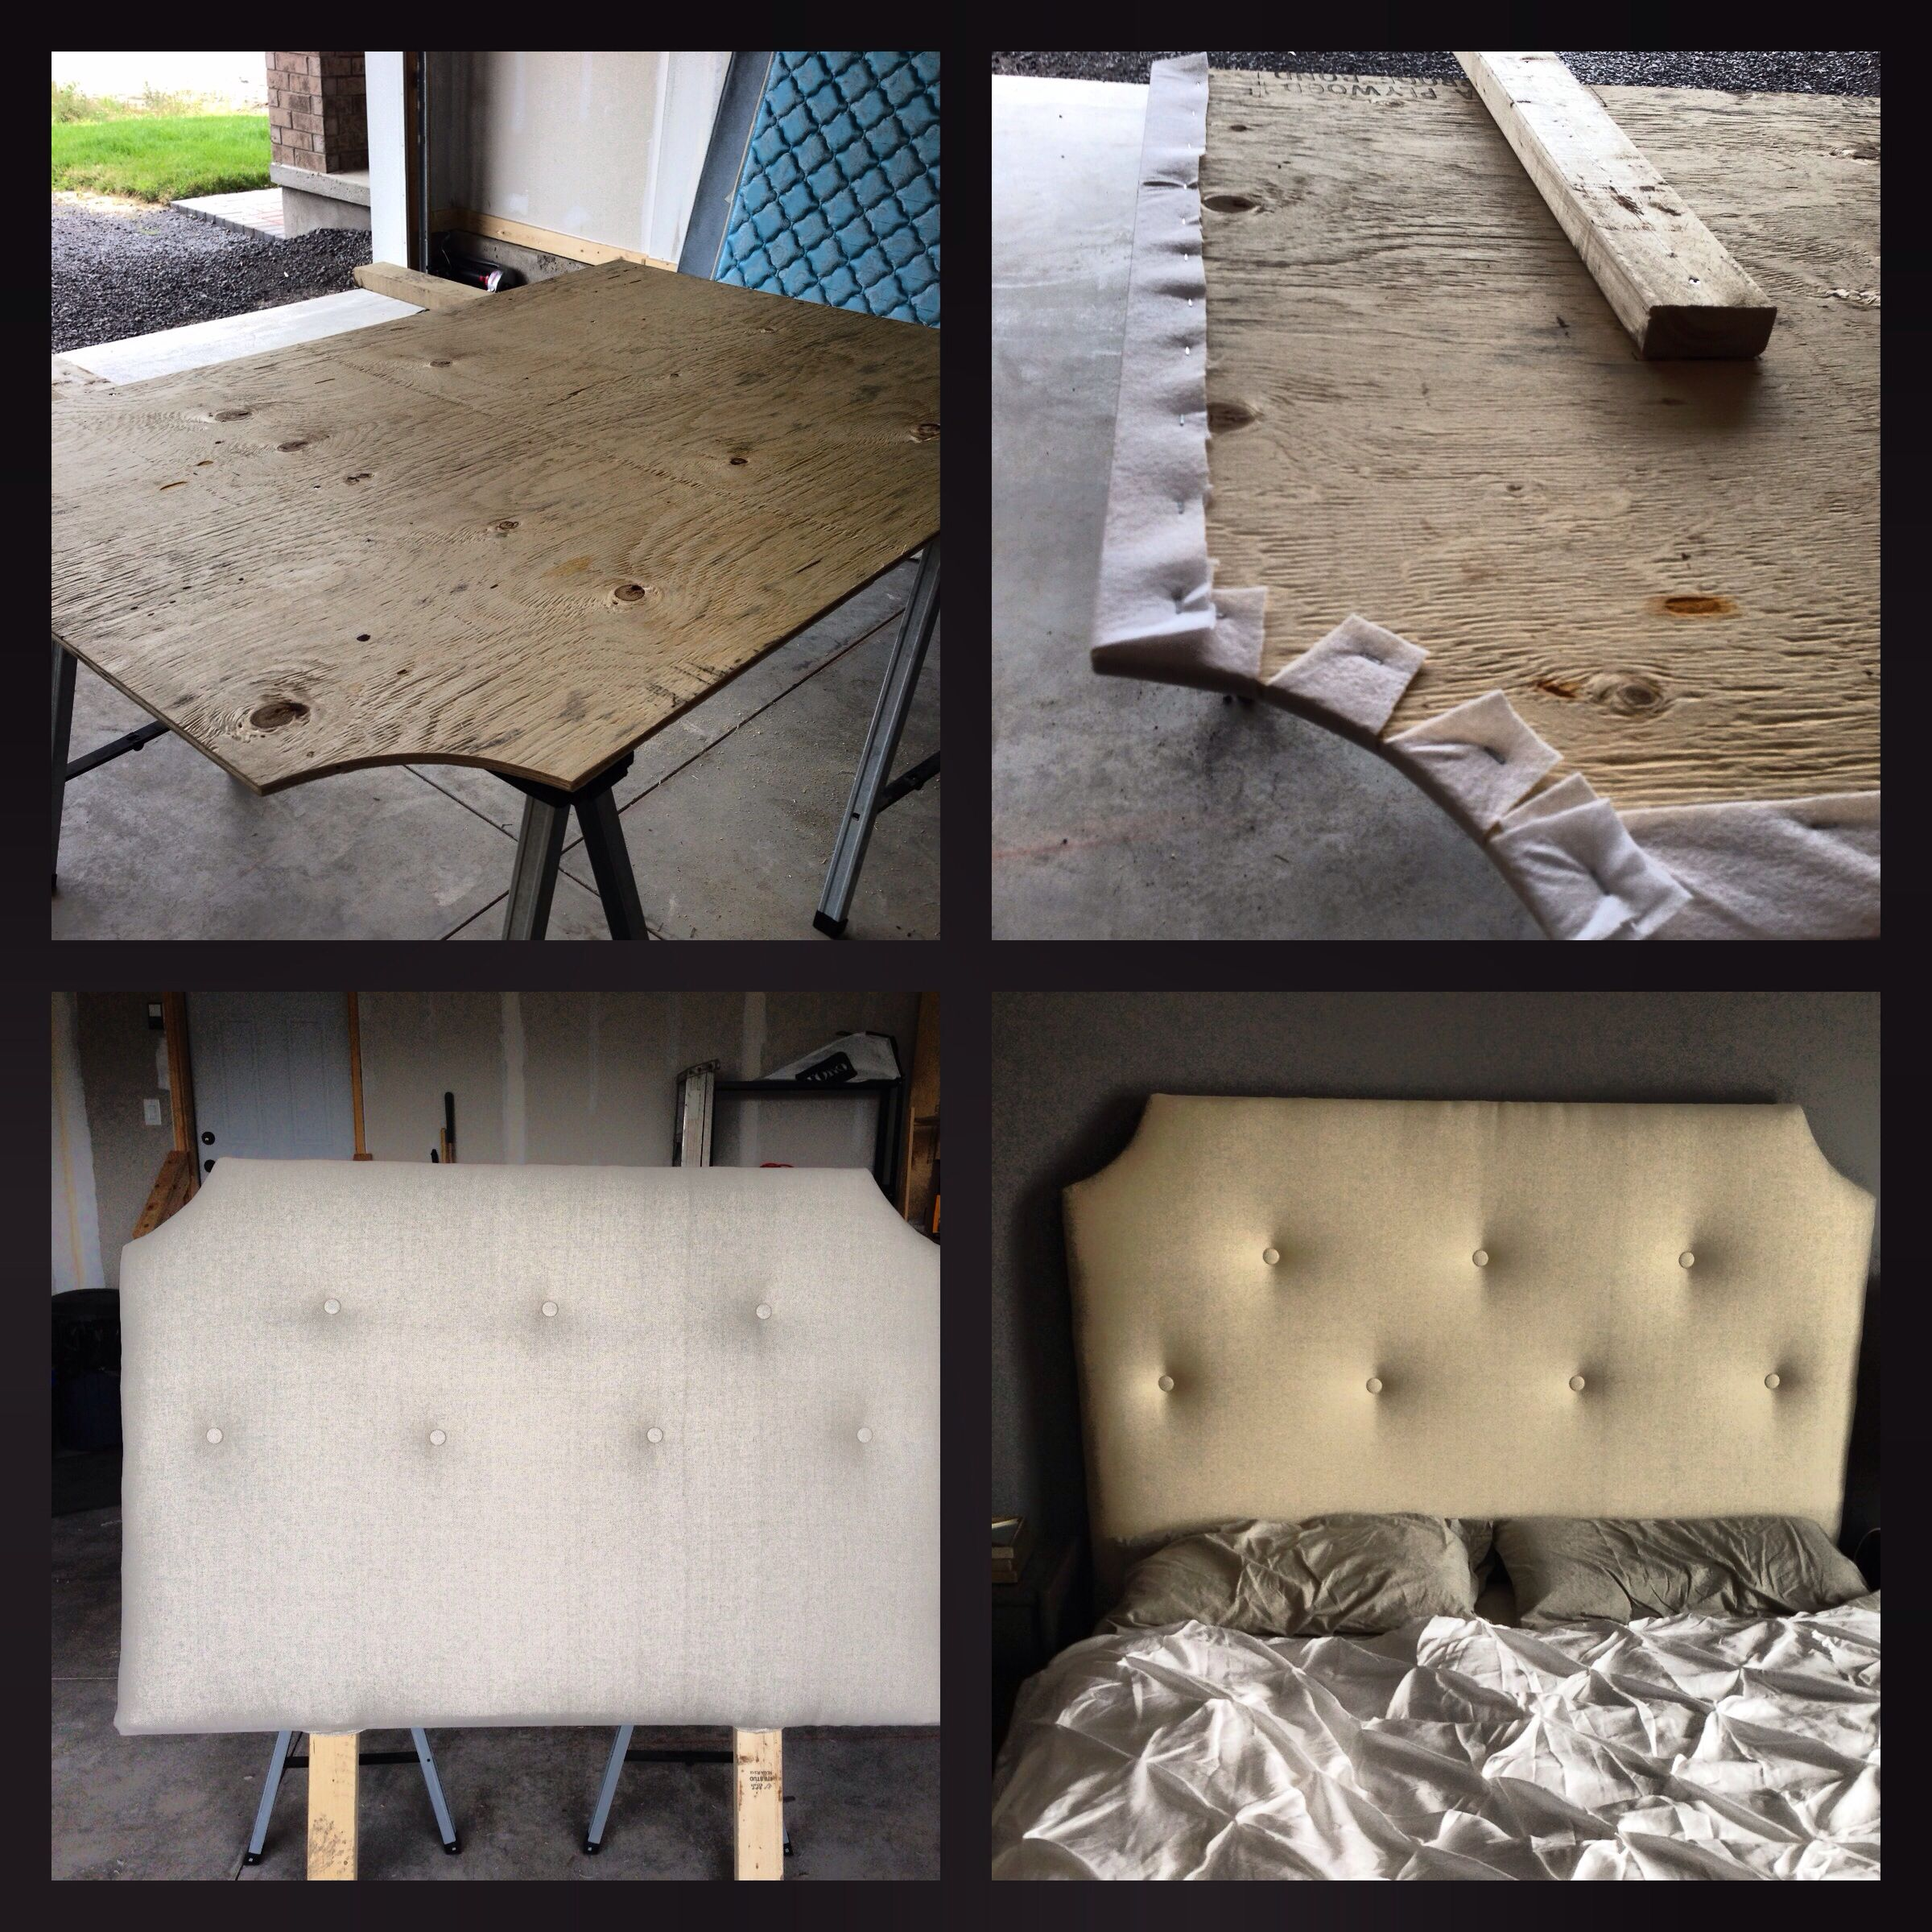 DIY tufted upholstered headboard | Good Ideas | Pinterest